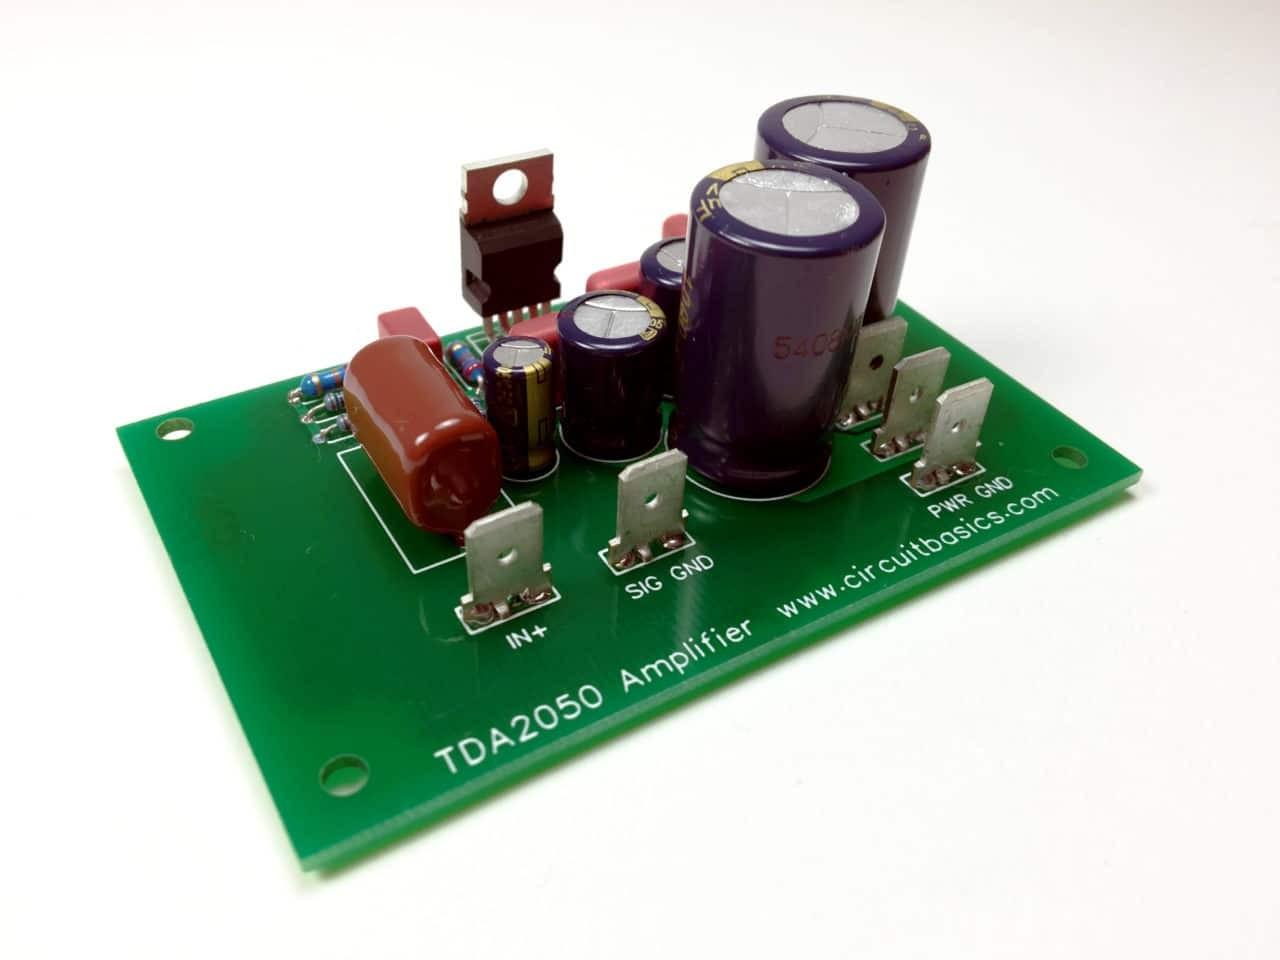 plete TDA2050 Amplifier Design and Construction Assembled Amp